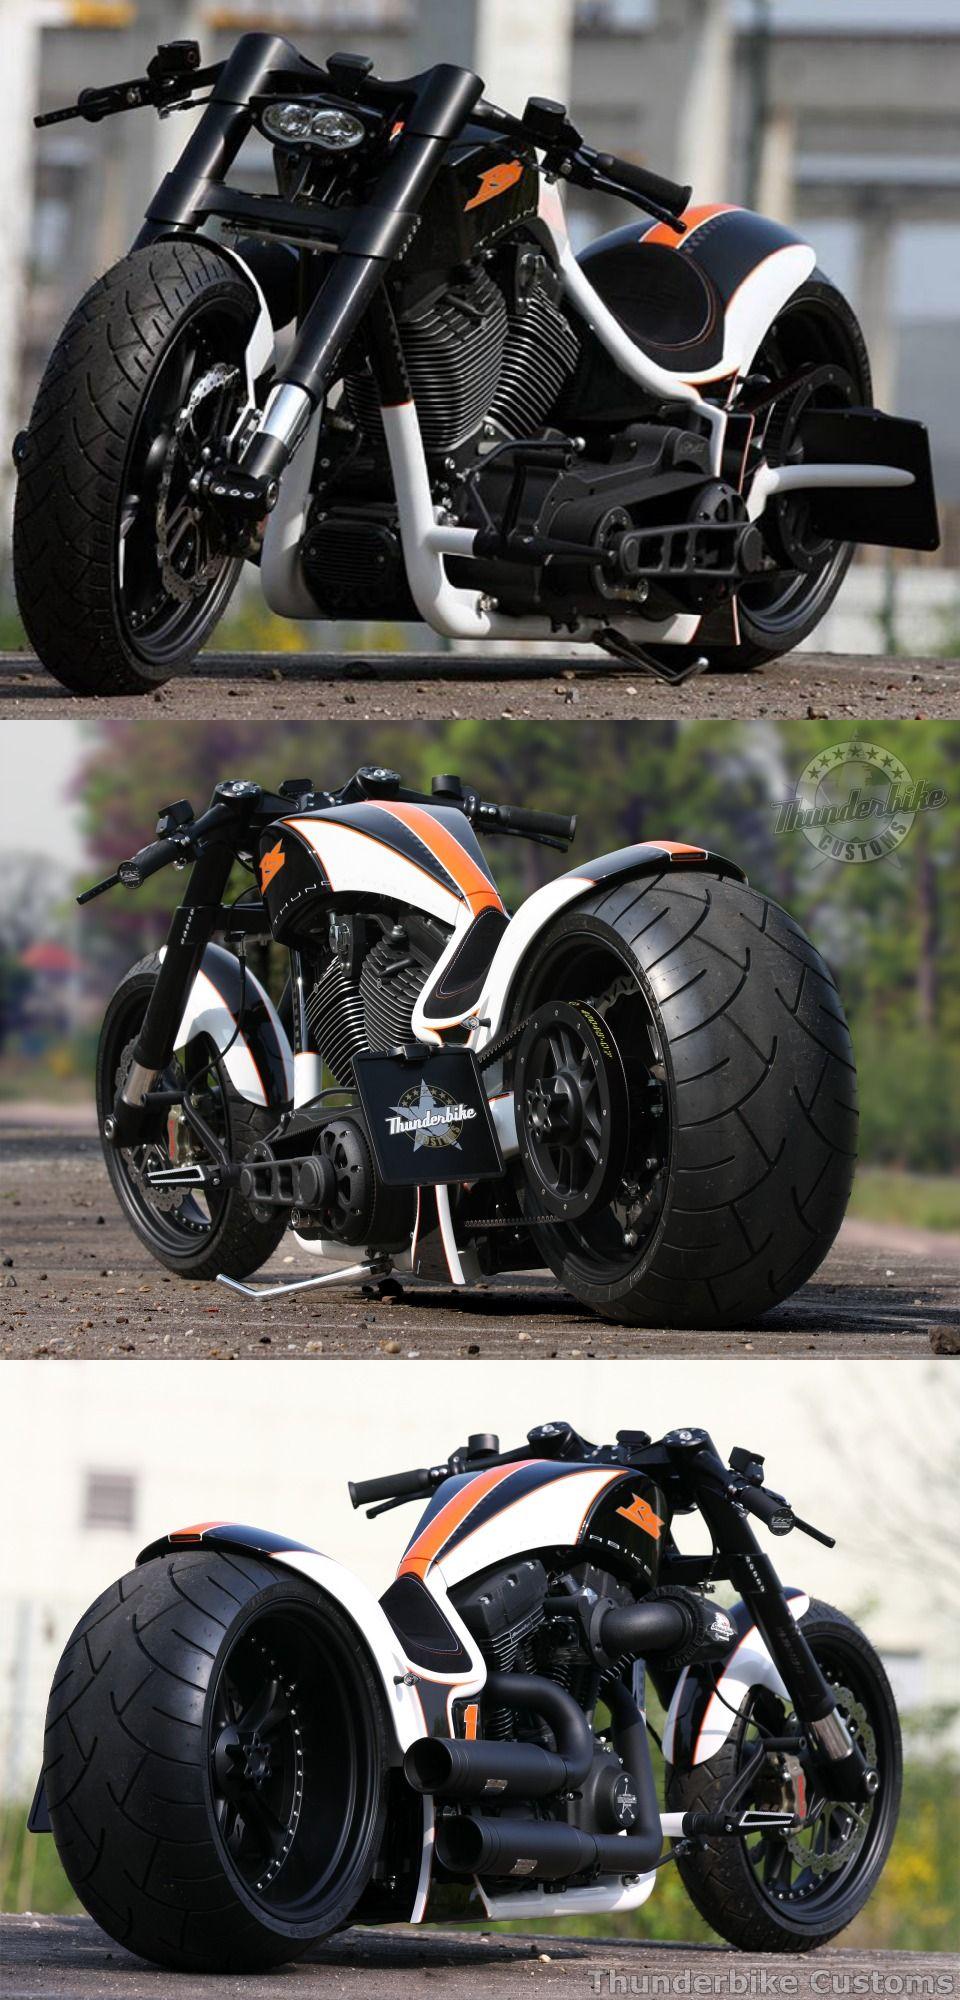 Harley Davidson Bike Models In India 2019 Classic Harley